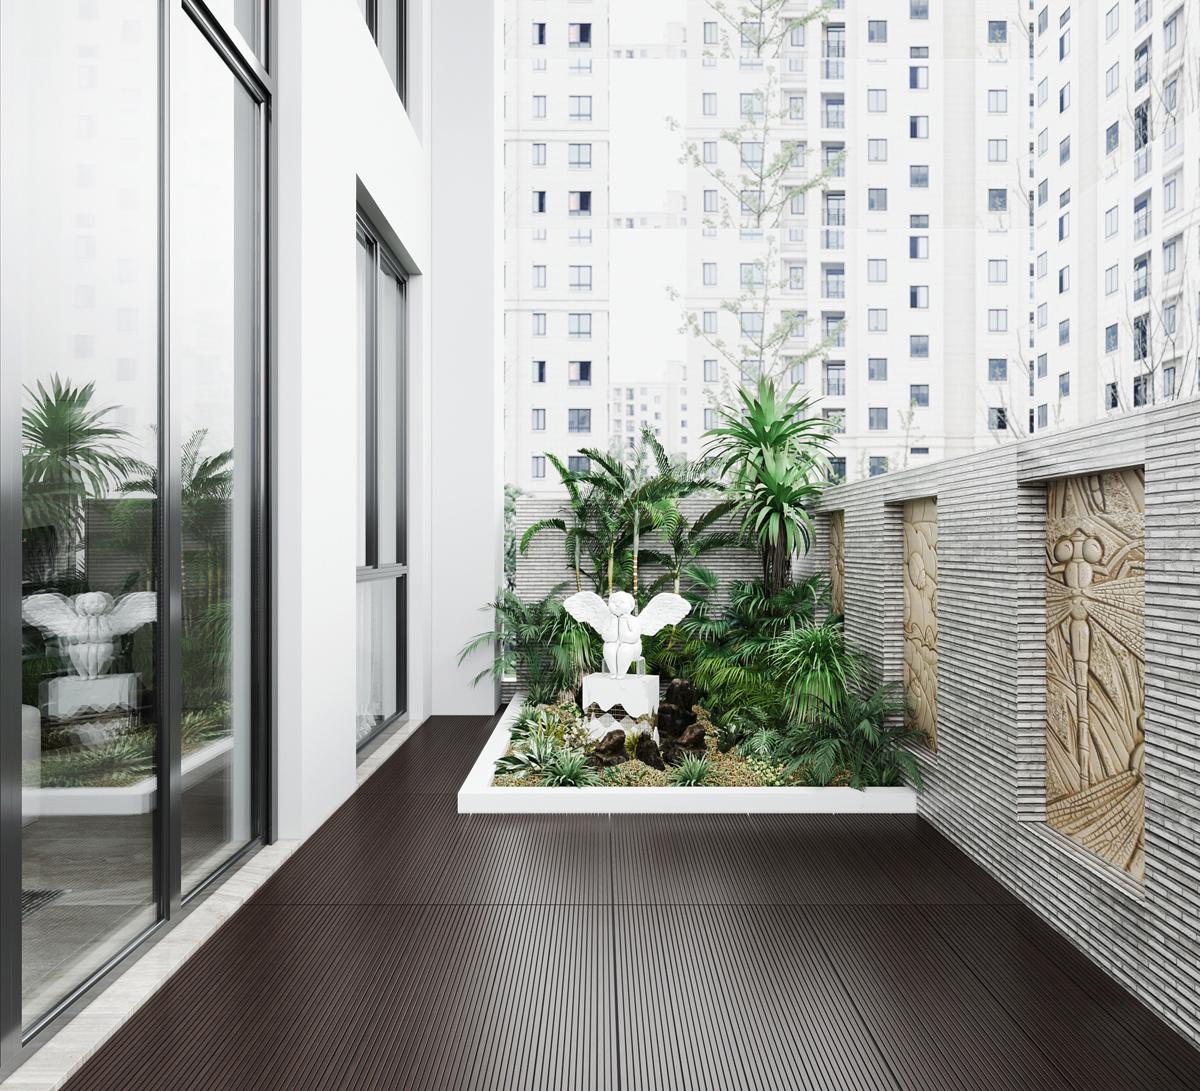 thiet-ke-noi-that-the-mansion-park-city-hanoi-co-thuong (8)